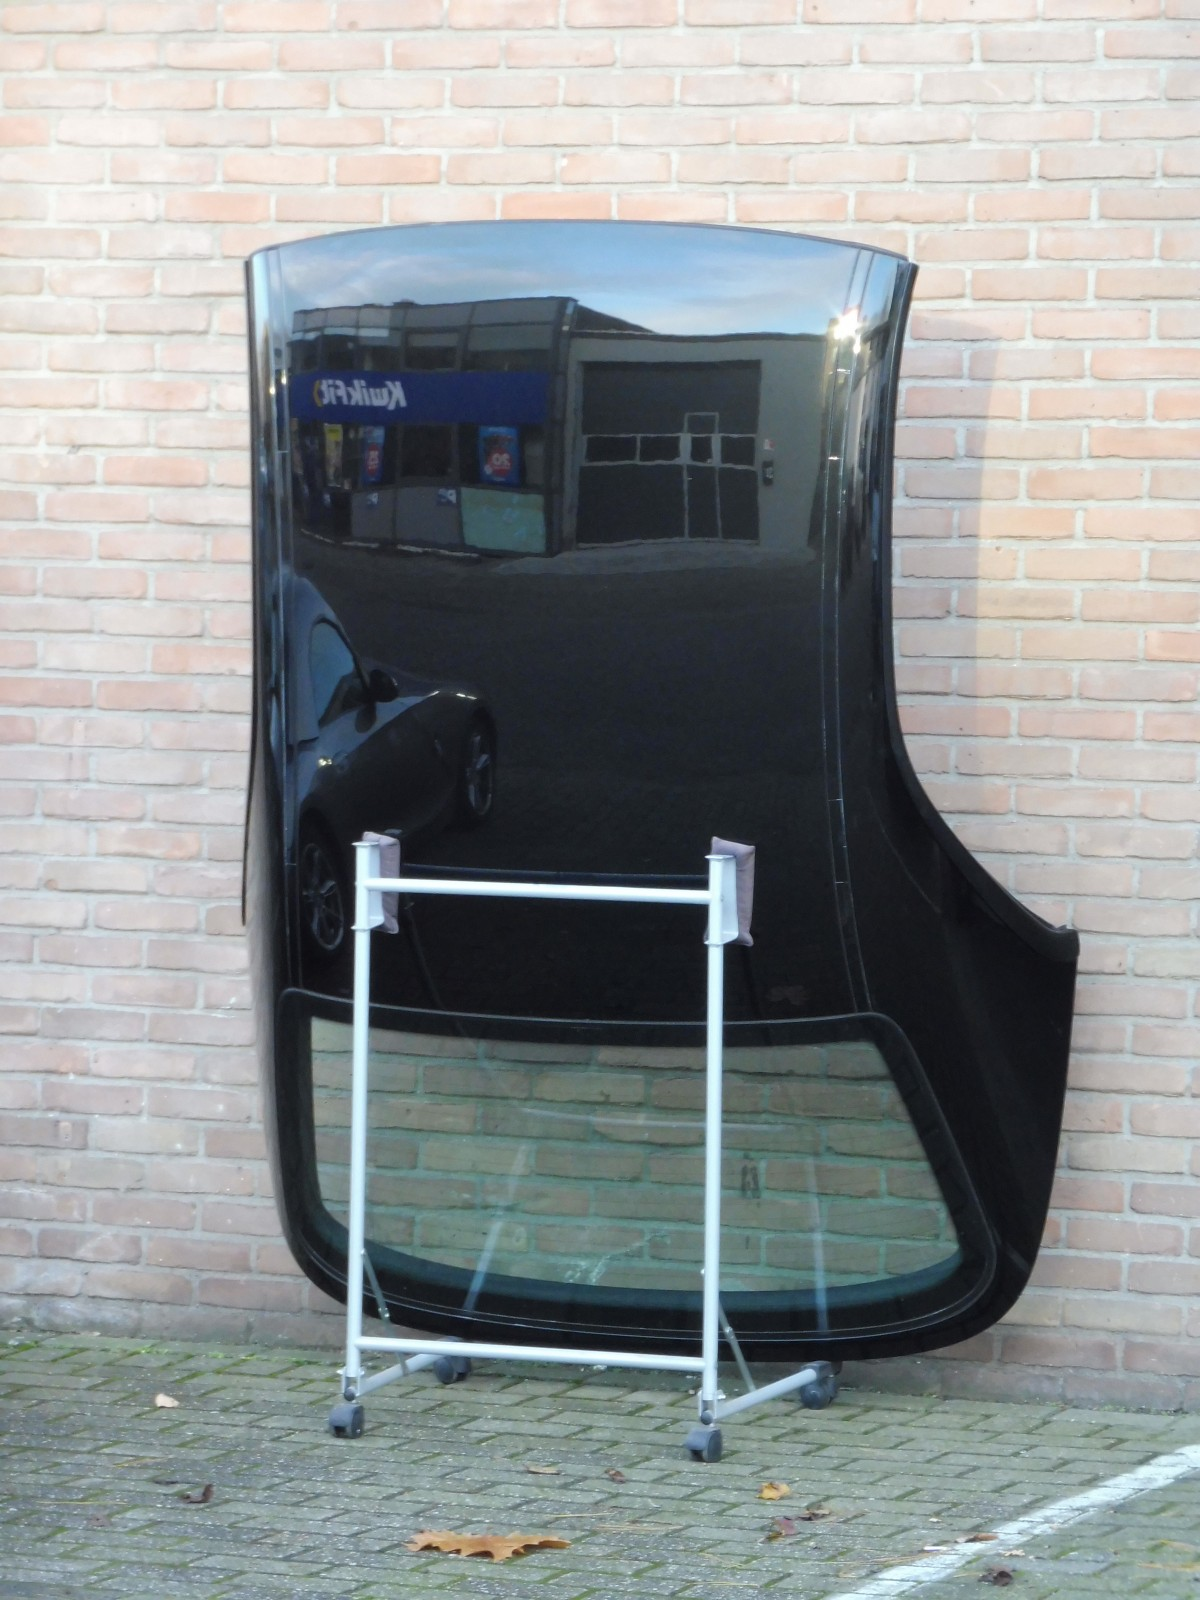 hardtop bmw e46 saphierschwarzmetallic cabrio care. Black Bedroom Furniture Sets. Home Design Ideas